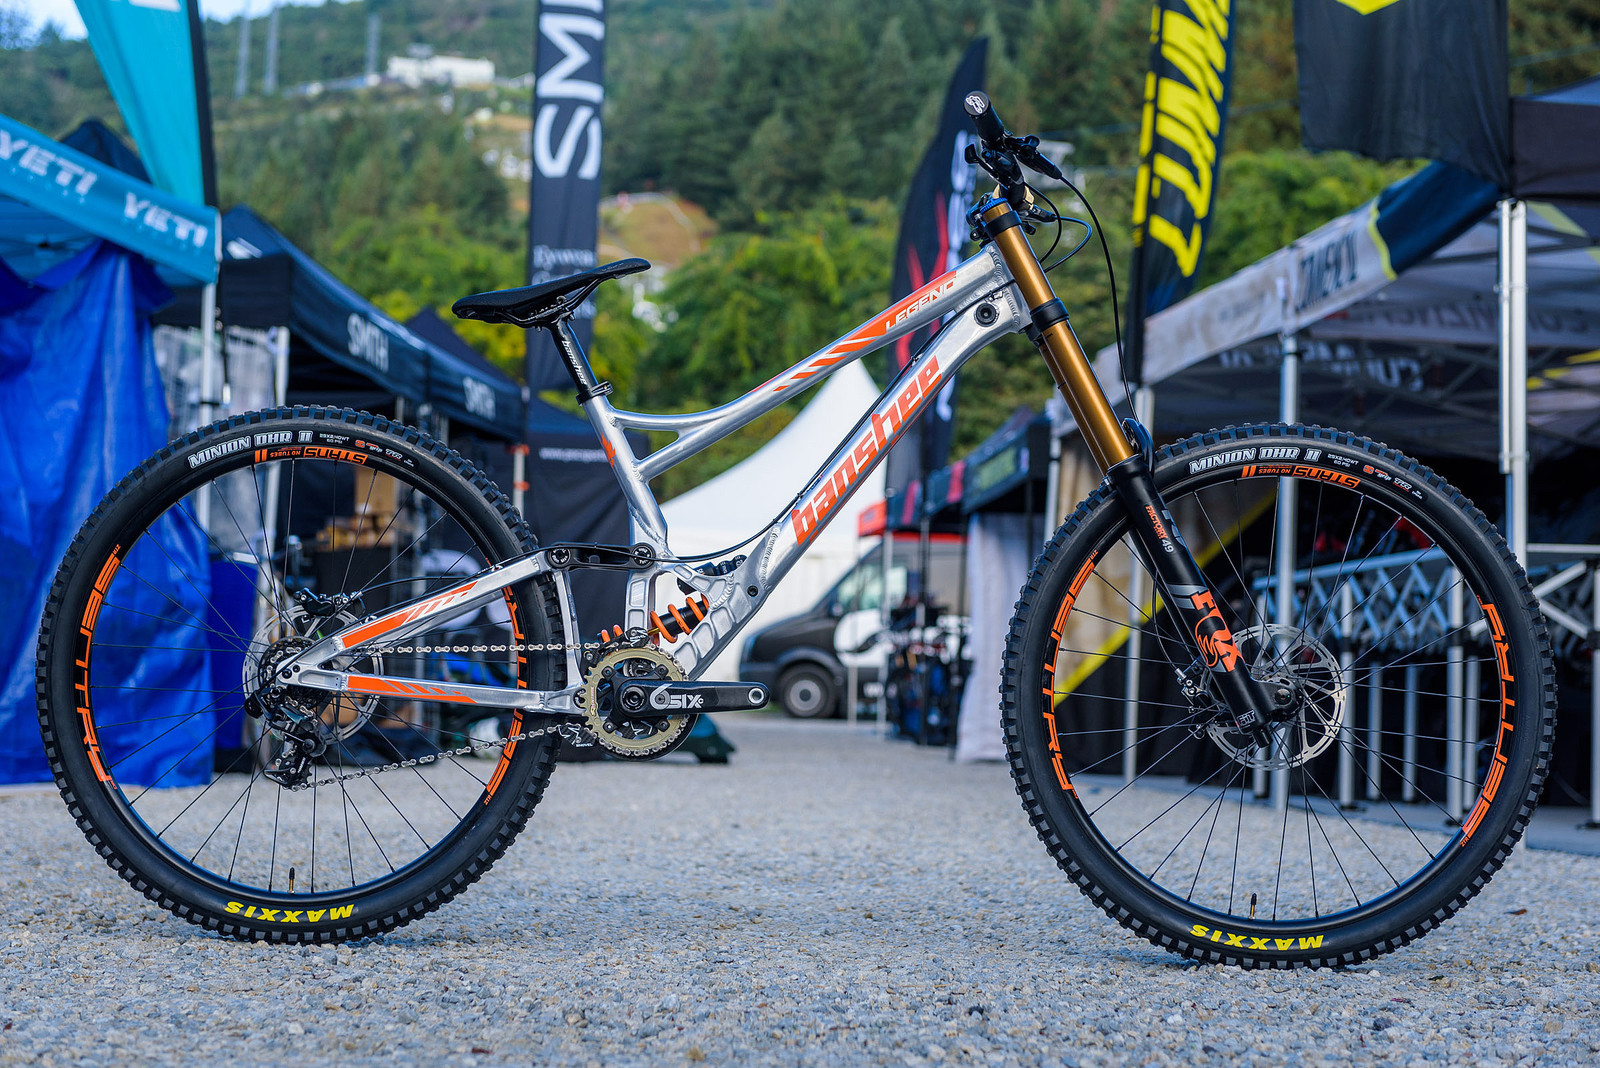 FIRST LOOK: The New Banshee Legend 29er - New Banshee Legend 29er - Mountain Biking Pictures - Vital MTB